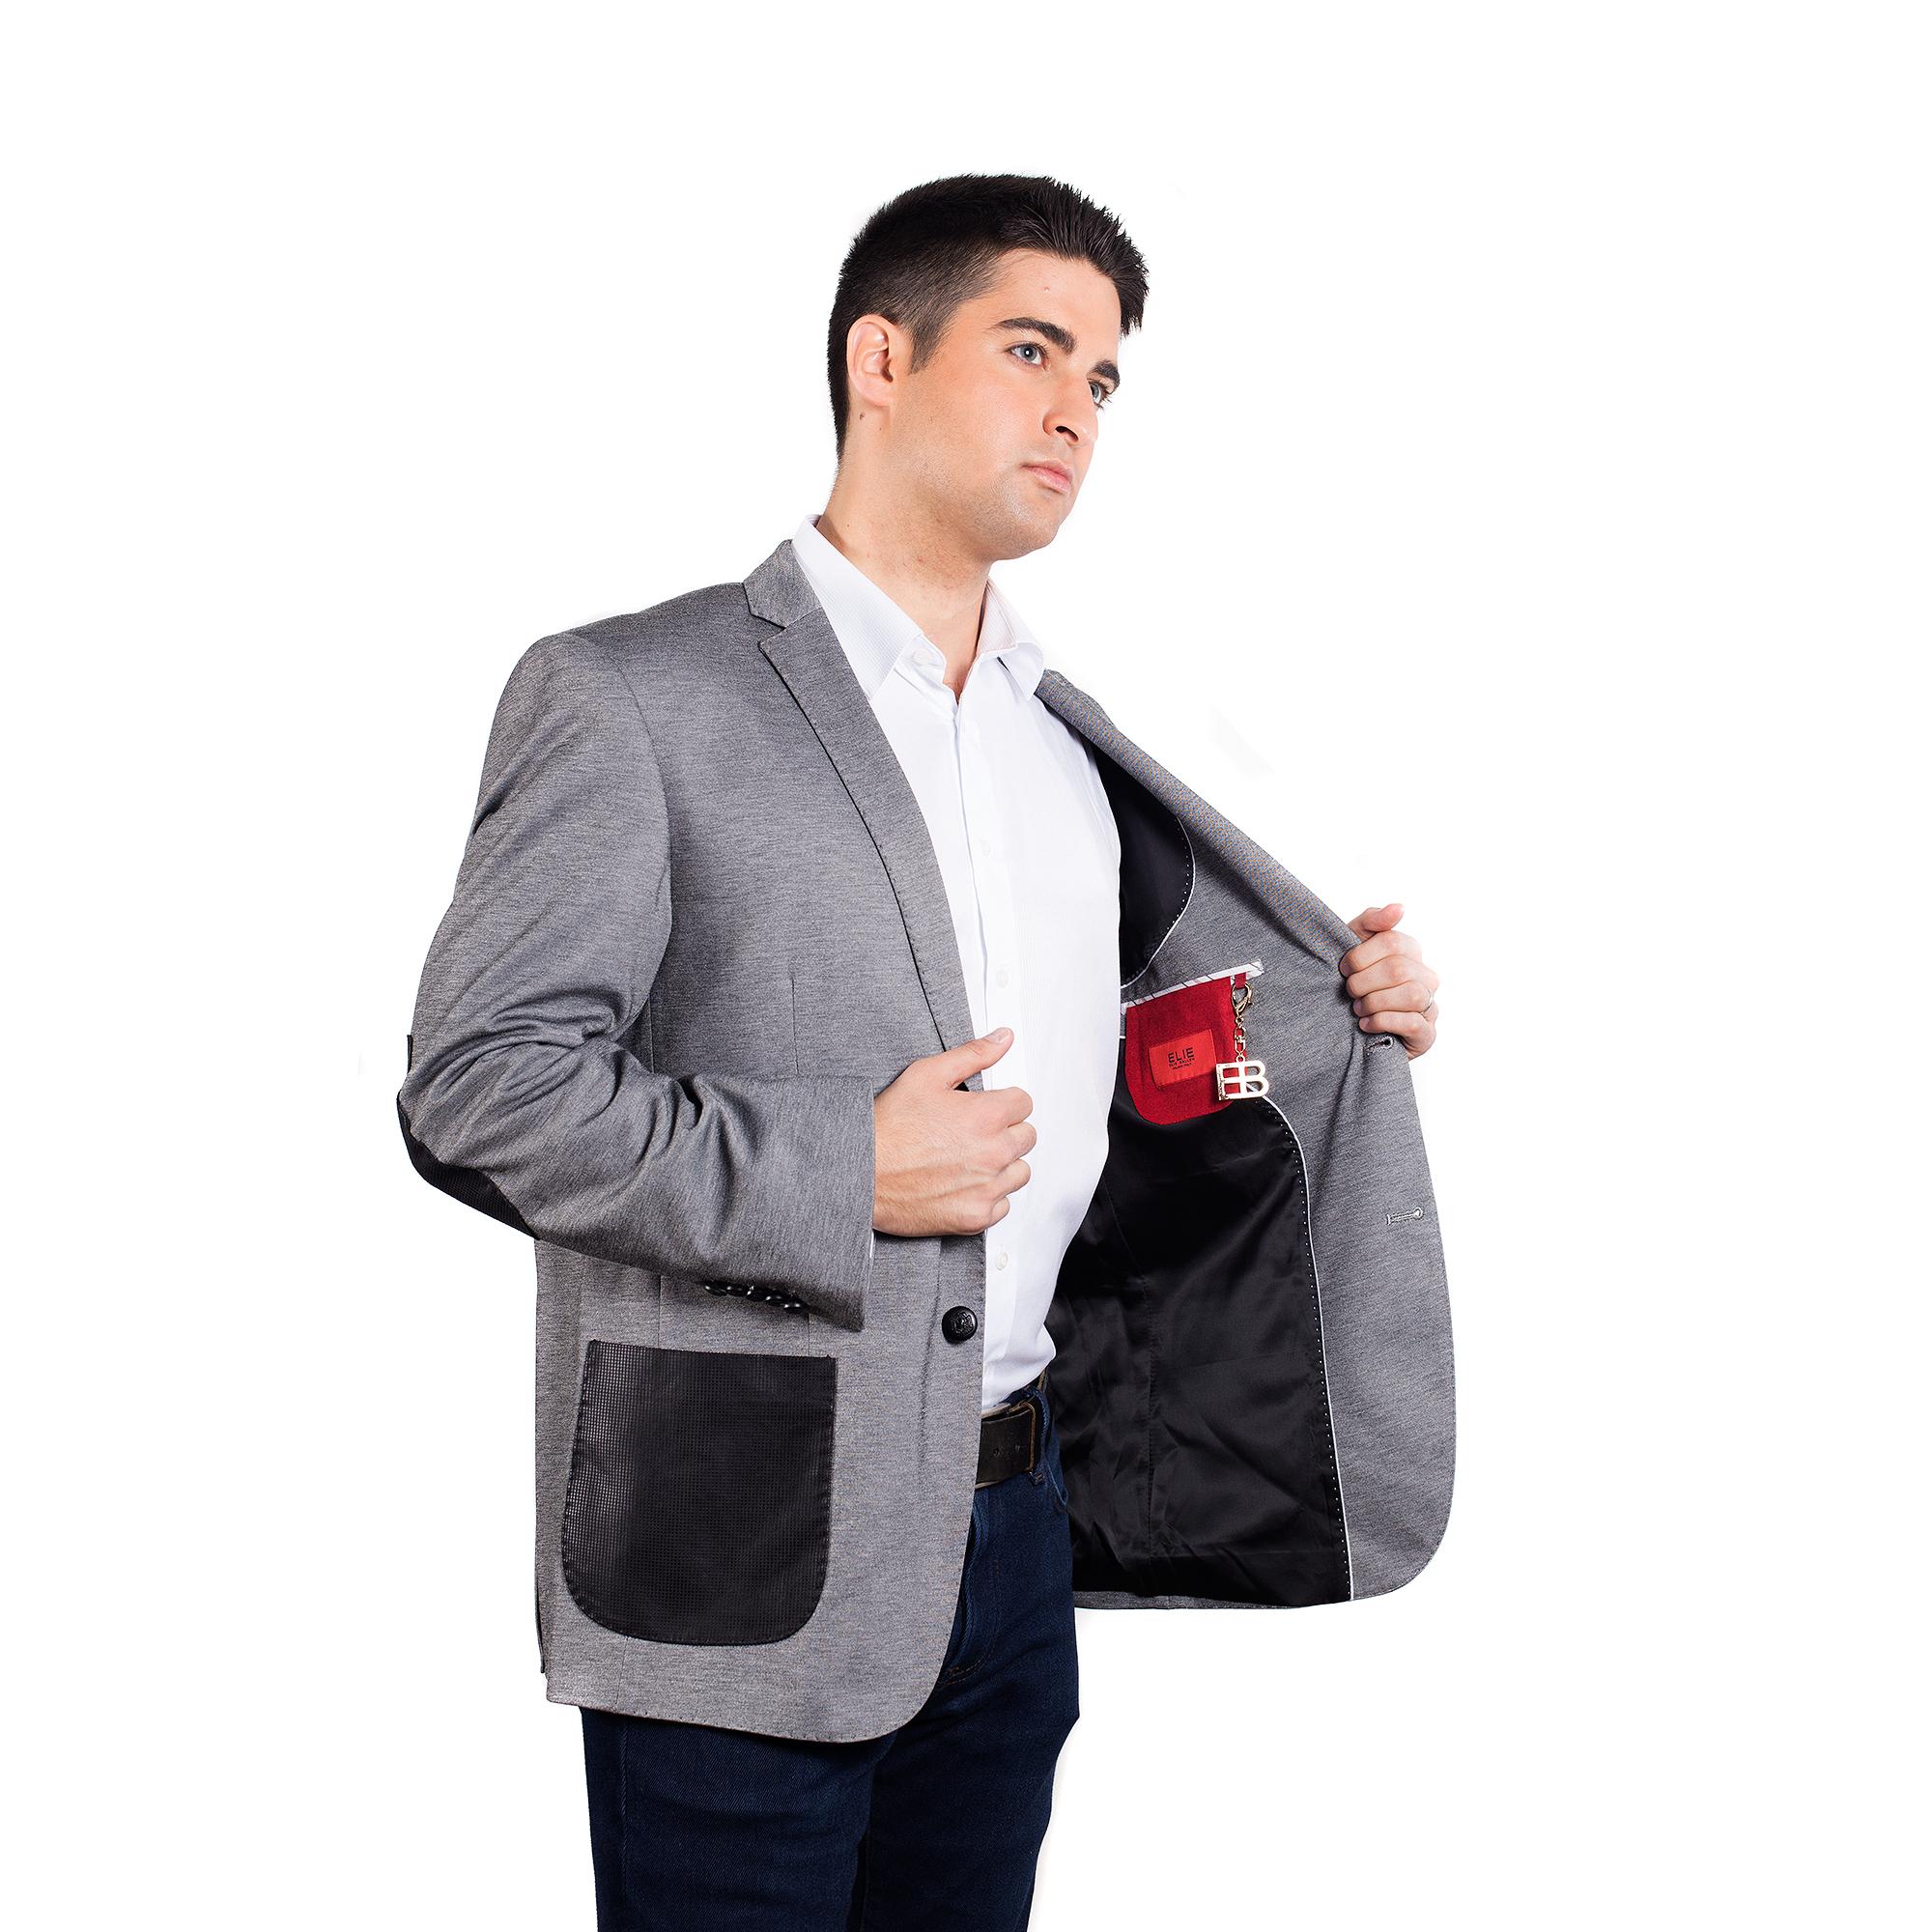 Knit Mélange with Leather Men Blazers / Sports Coat Jacket EBBW1542M